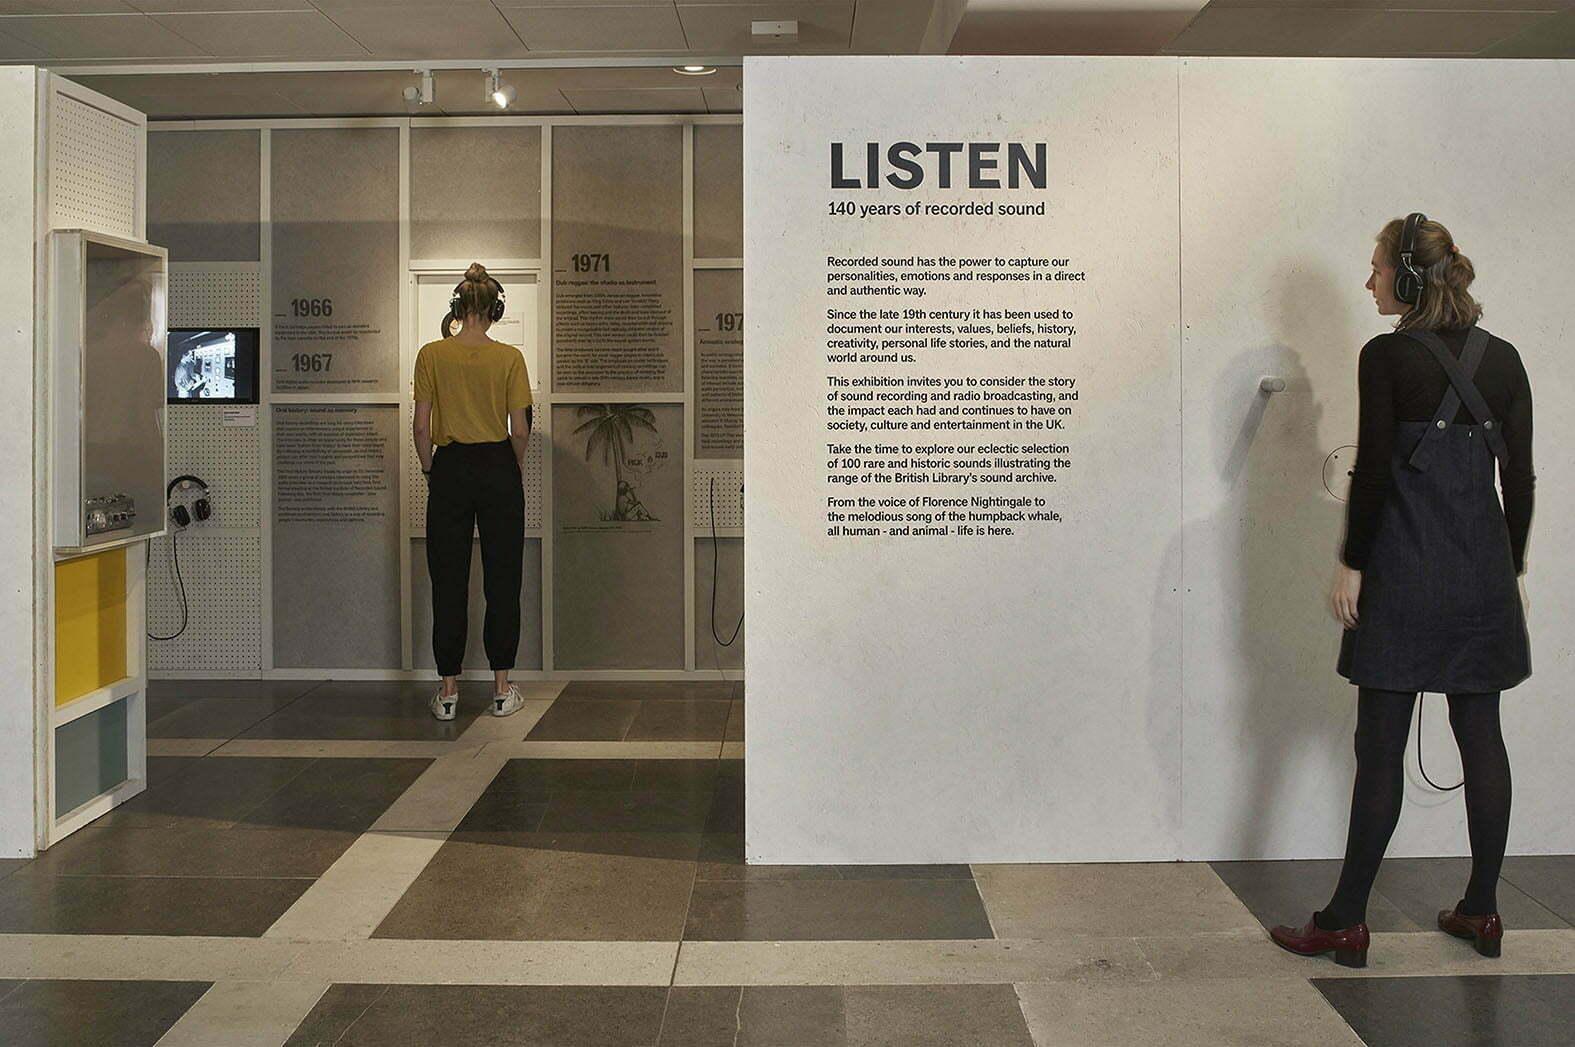 02_Lombaert_Studio_British_Library_Listen_04